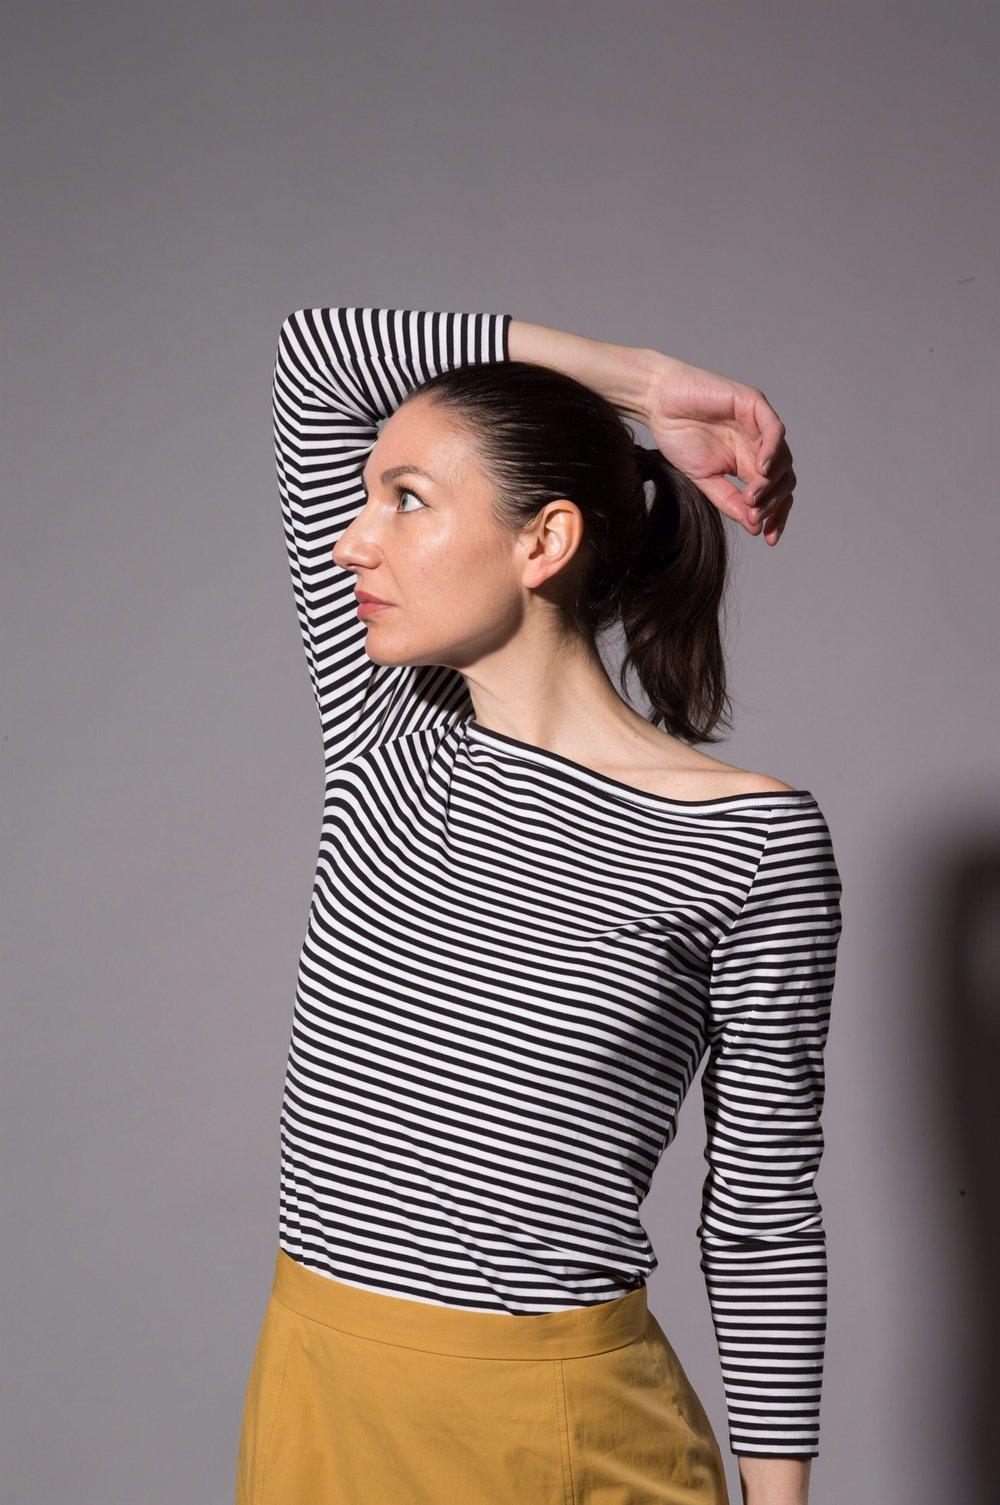 Audrey-Hepburn-style-profile.jpg